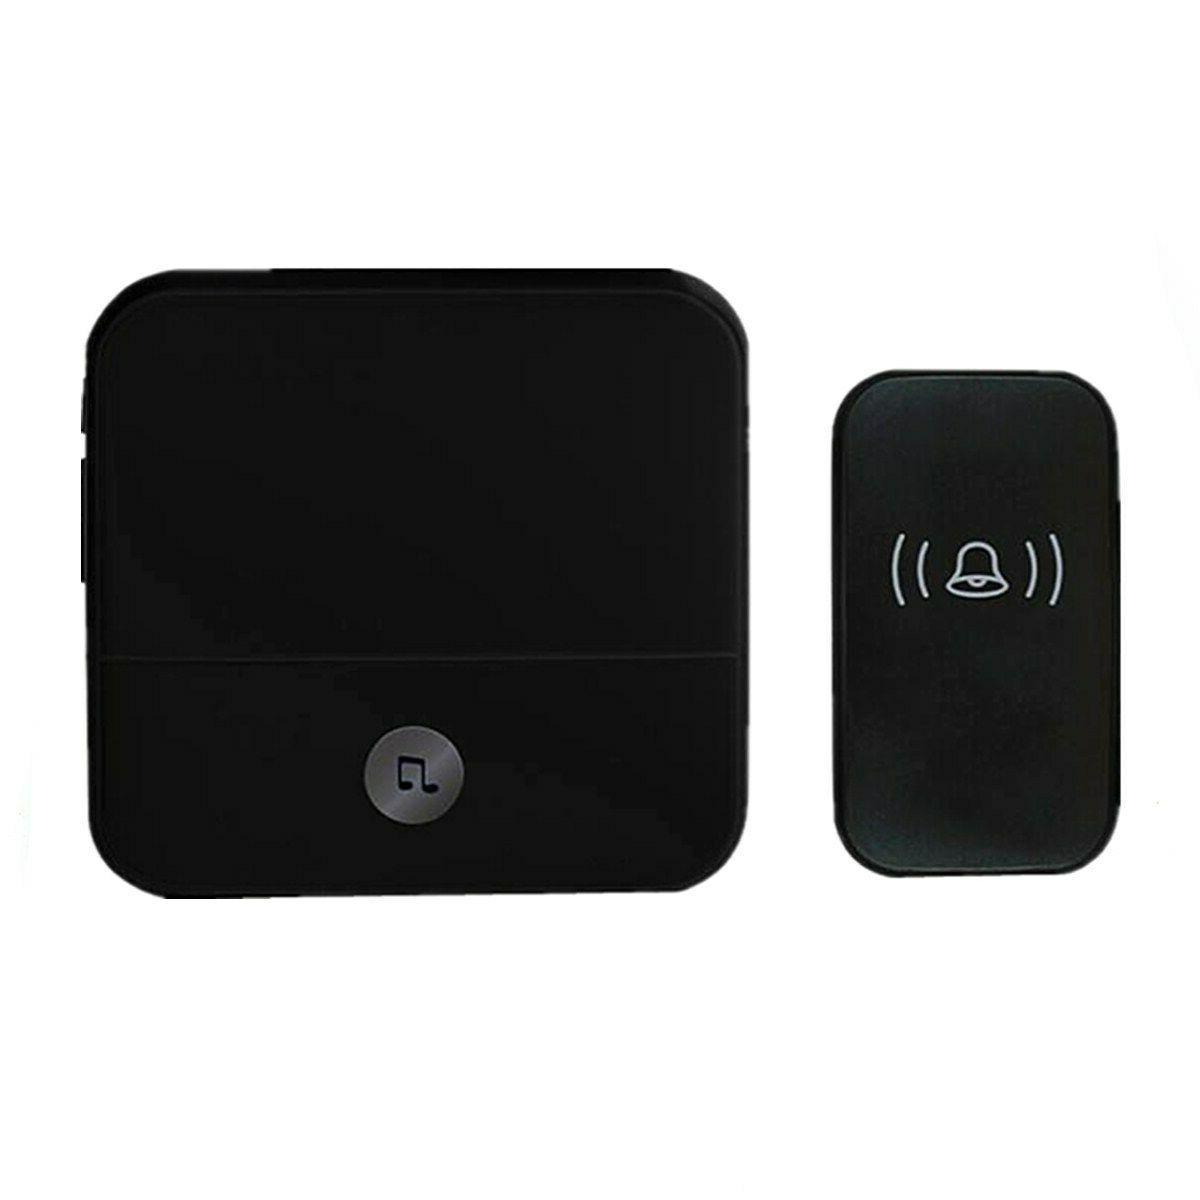 52 chime wireless door bell home plug